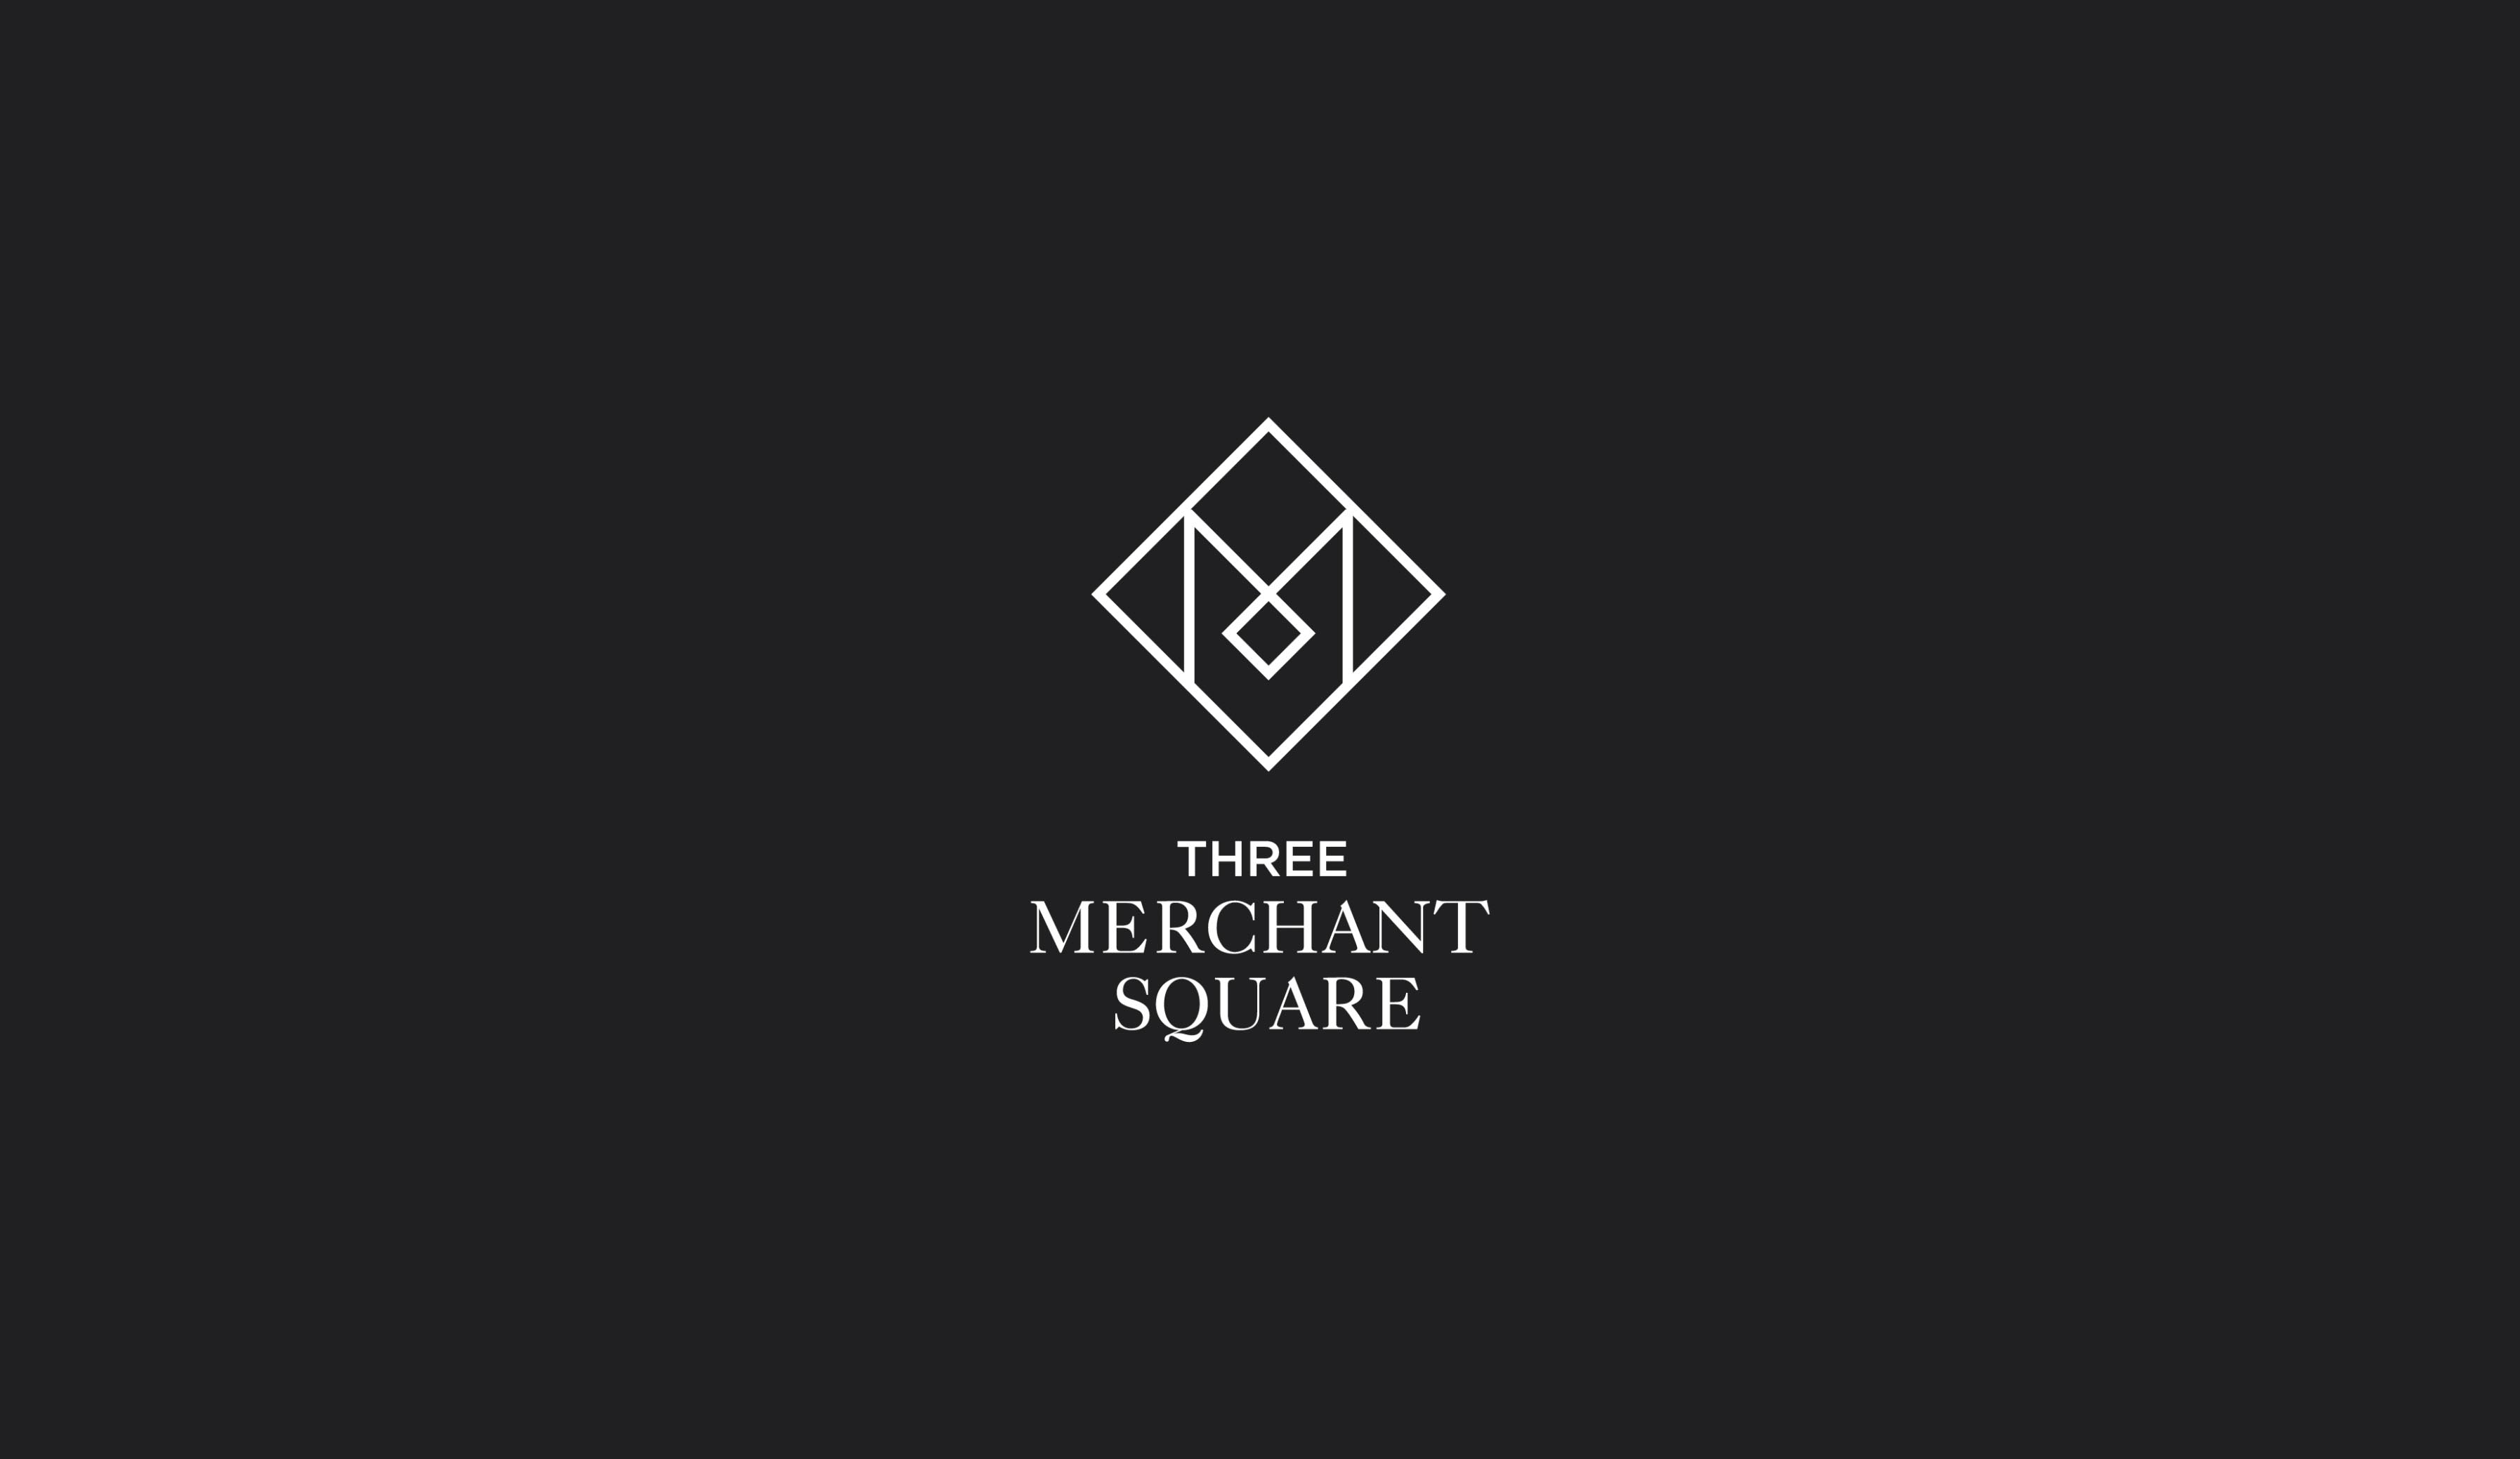 Three Merchant Square logo design